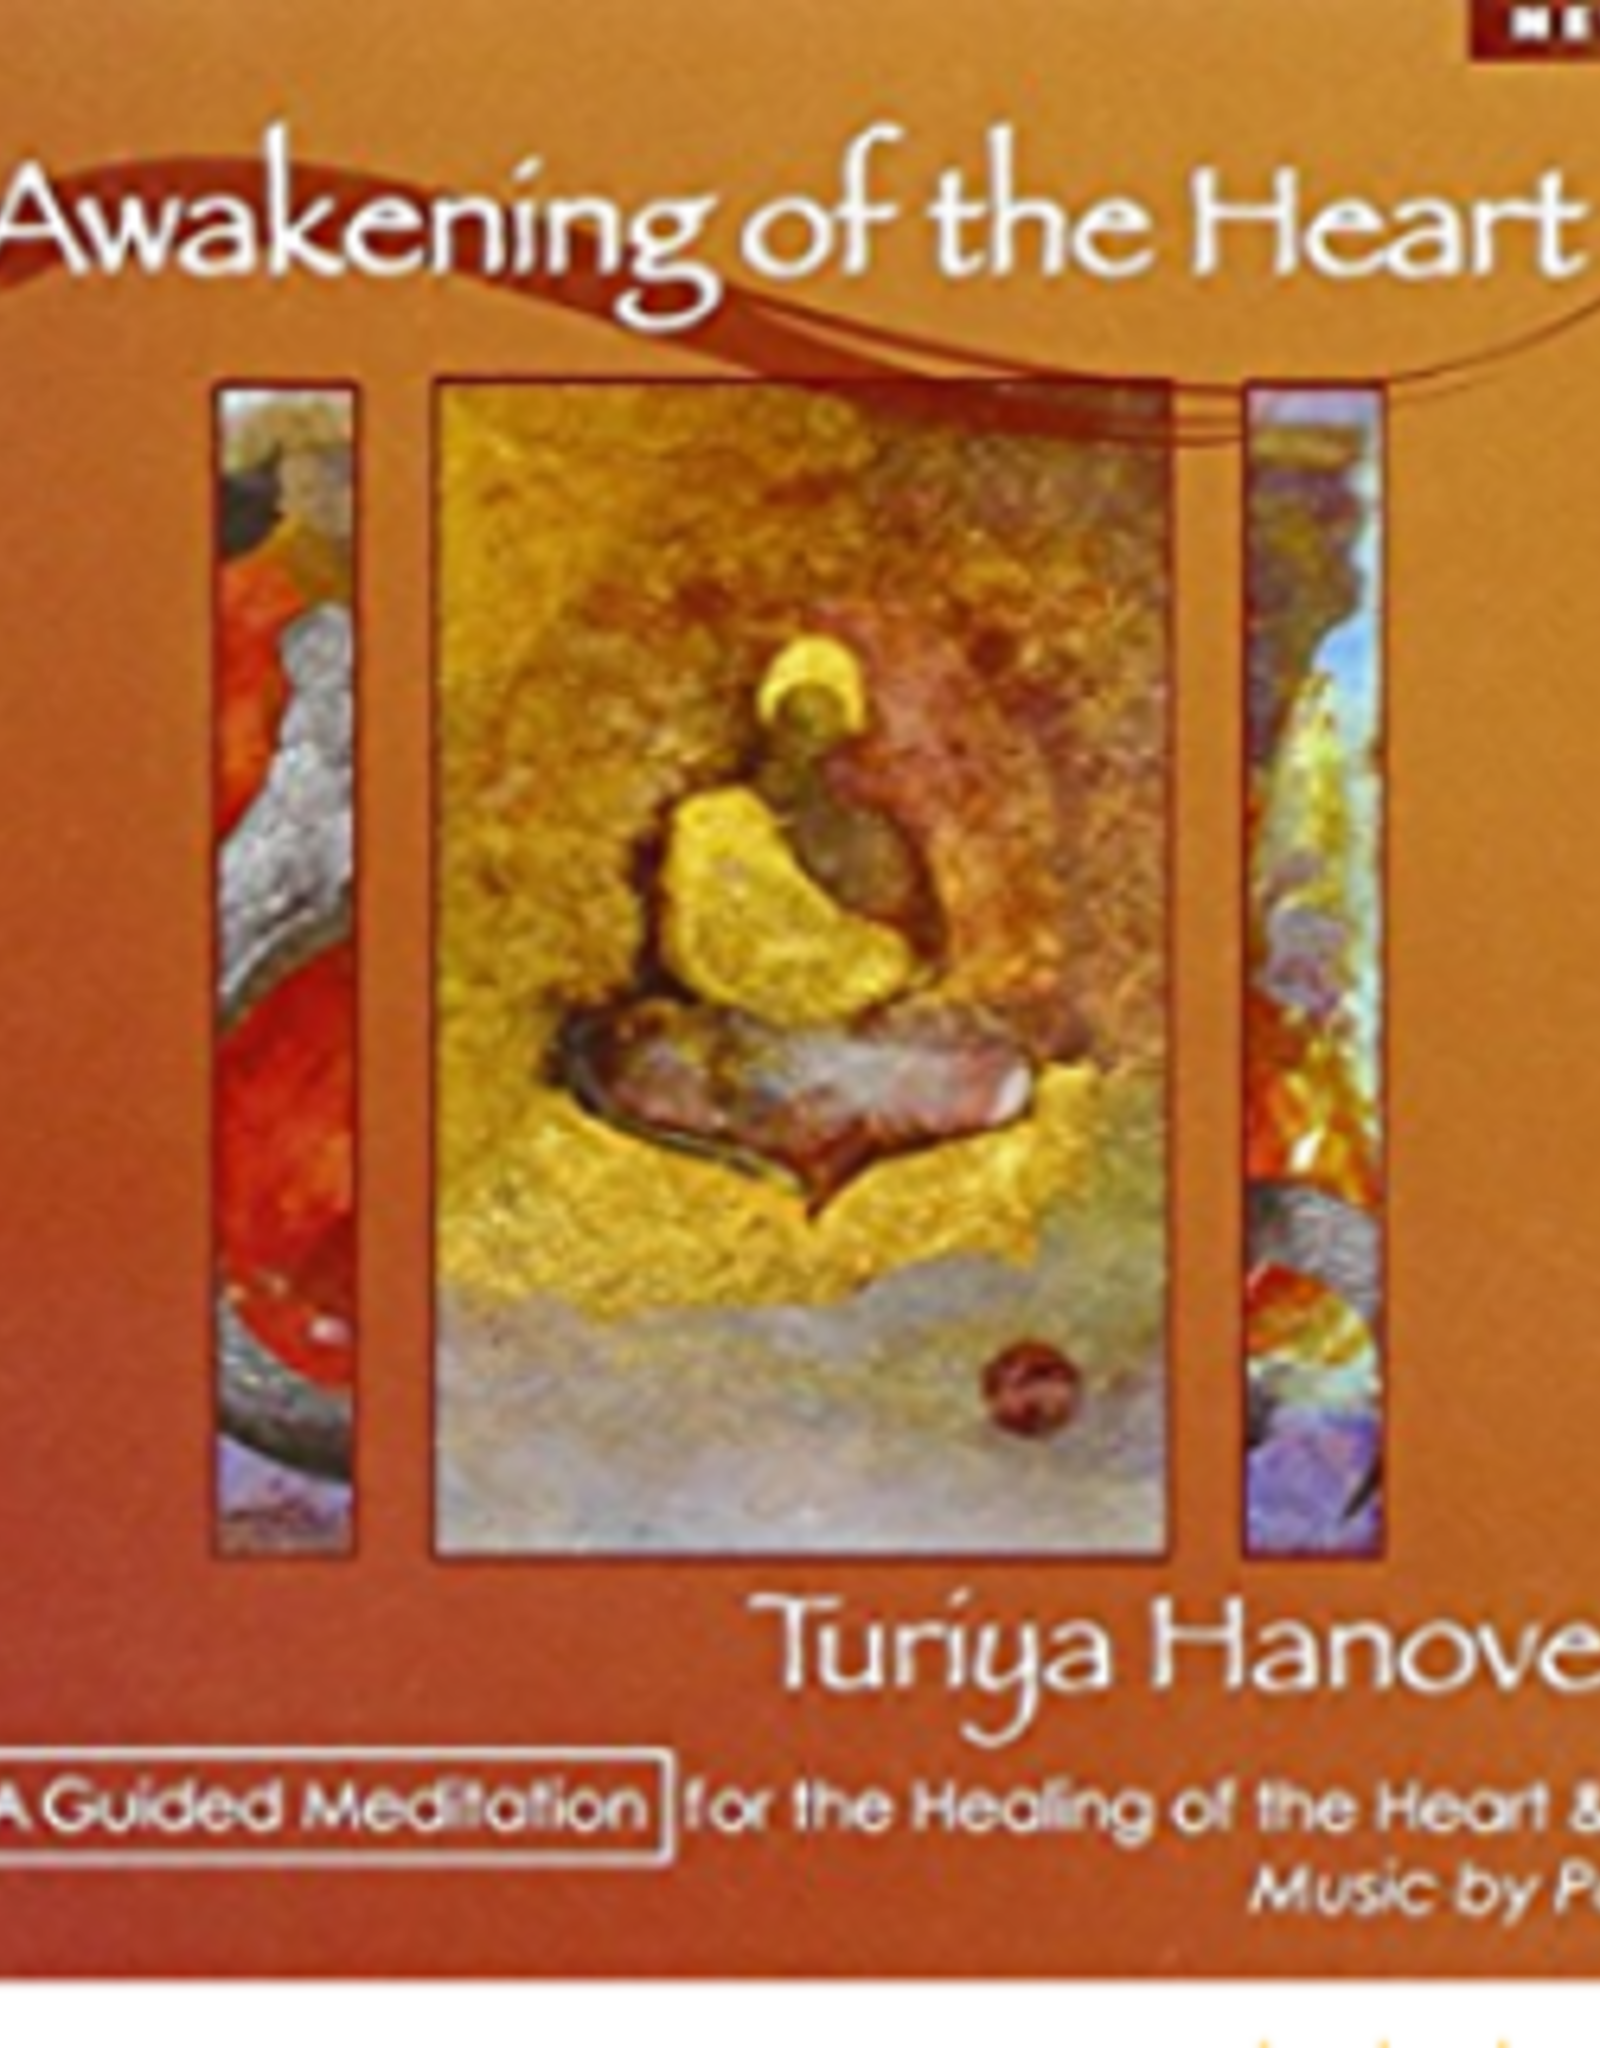 Turiya Hanover Awakening of the Heart CD by Turiya Hanover